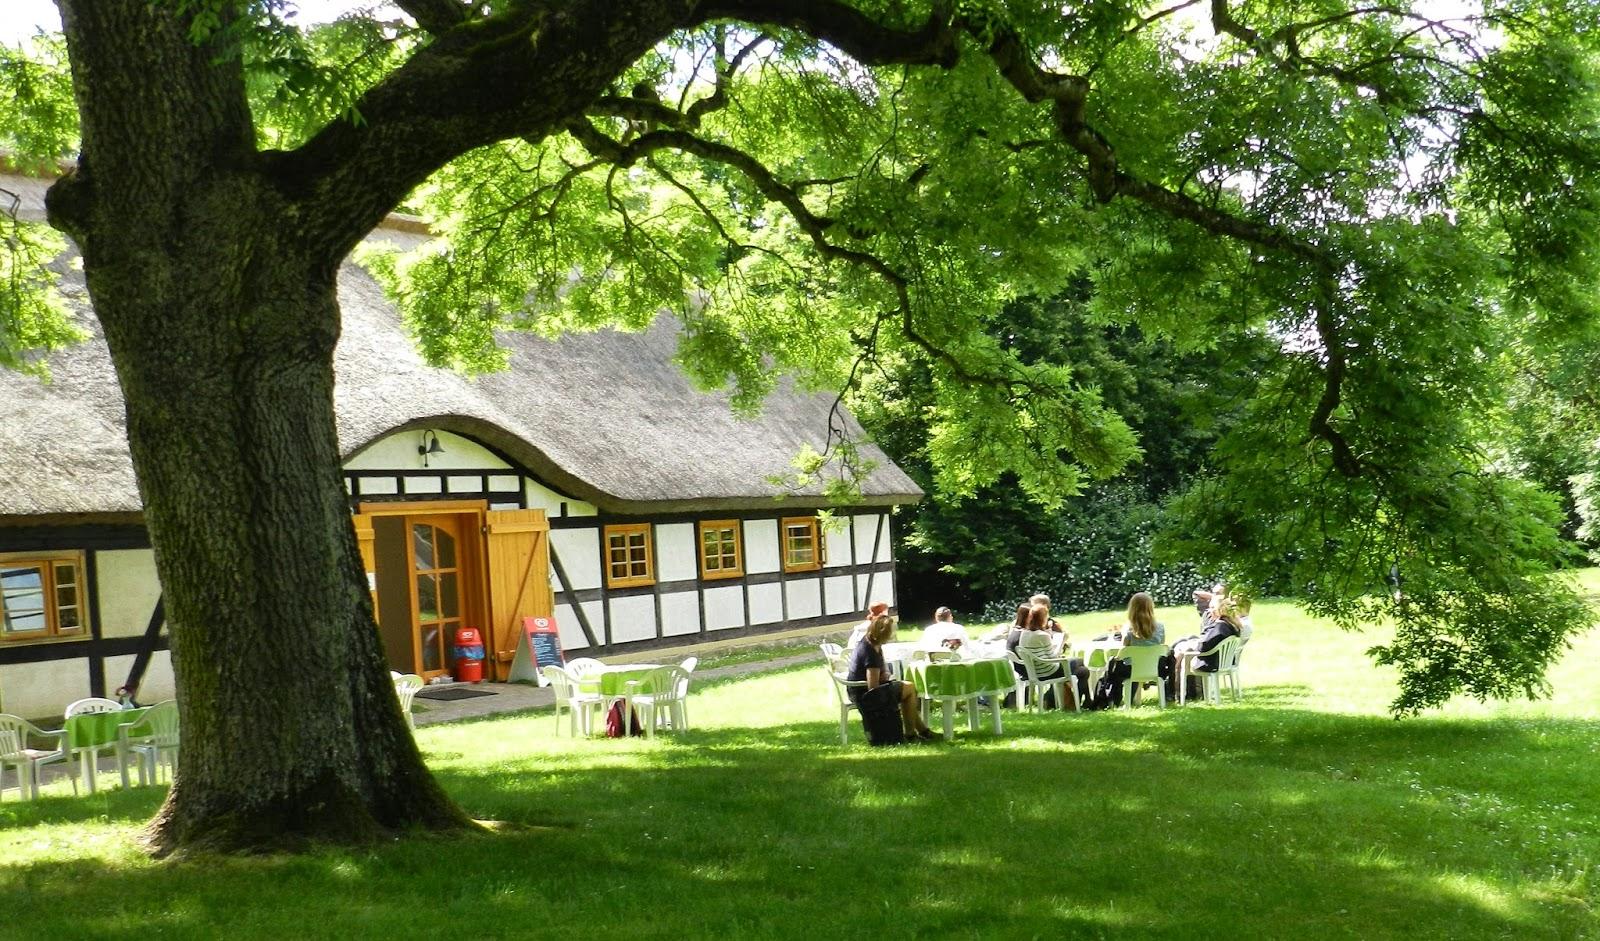 ankershagen schliemann museum